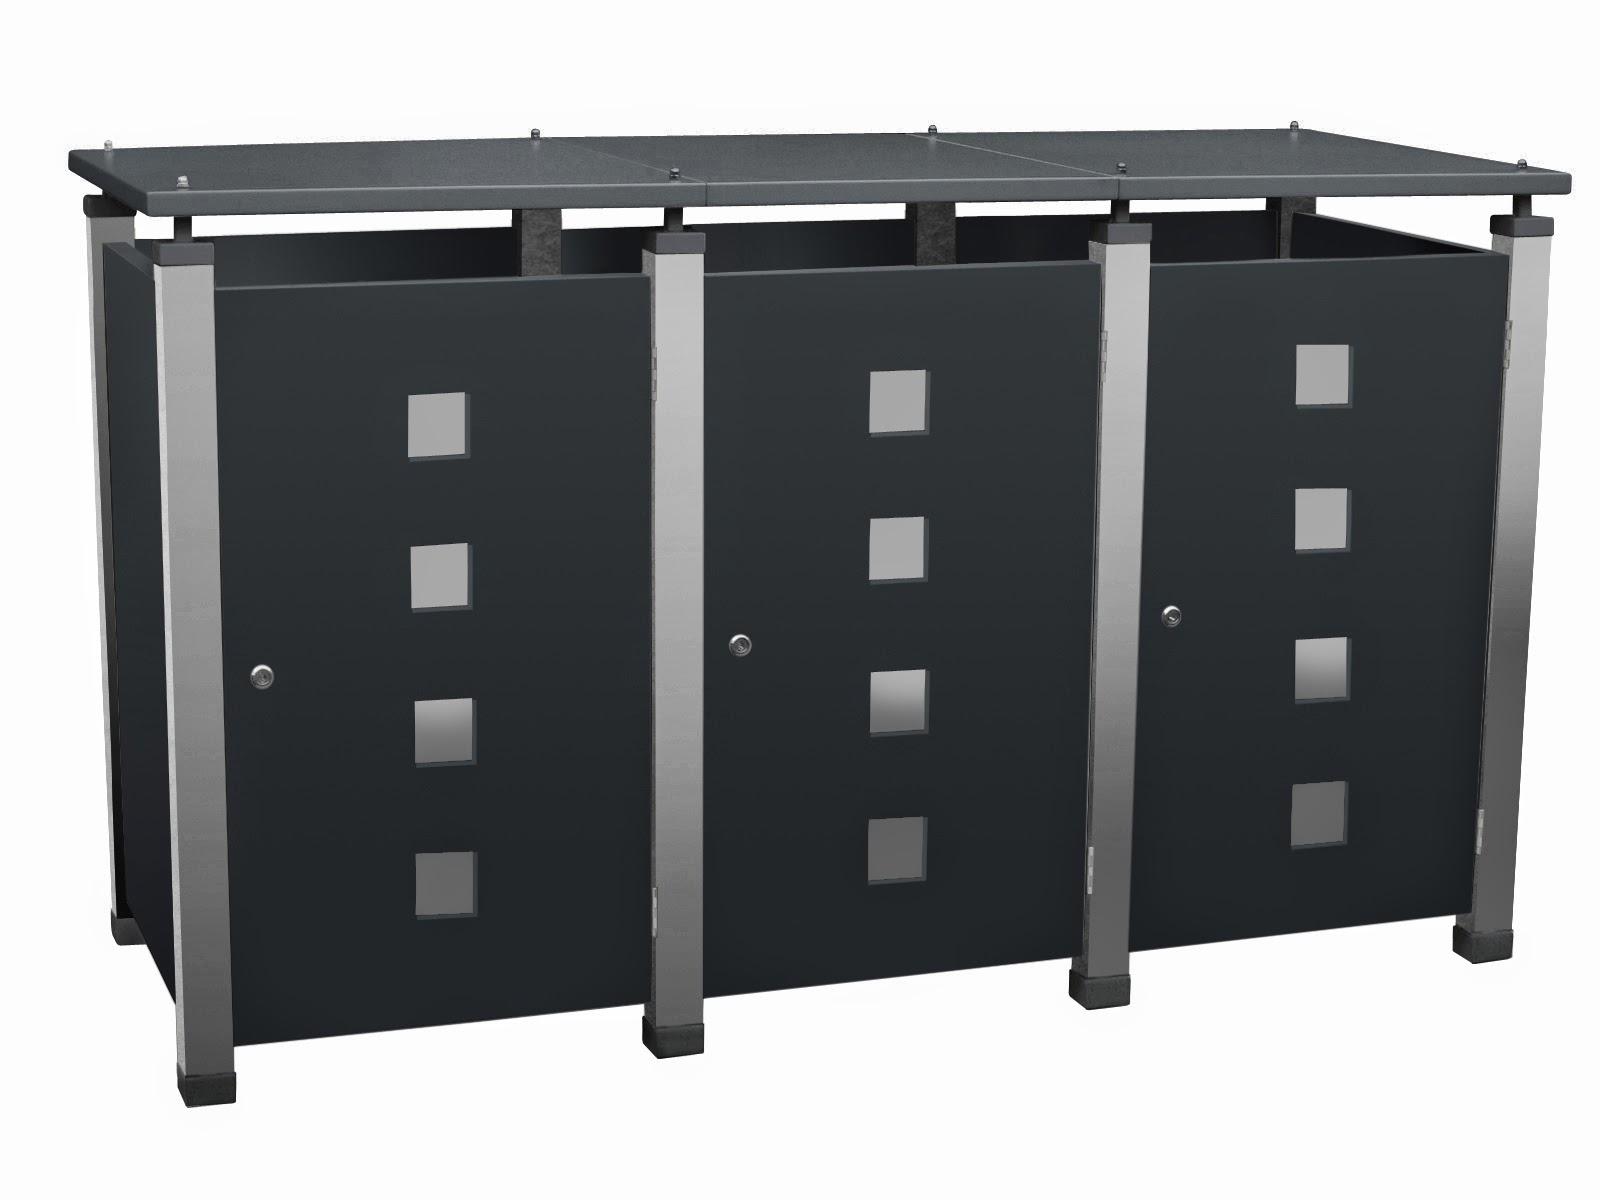 Mülltonnenbox Metall, Modell Pacco E Quad11